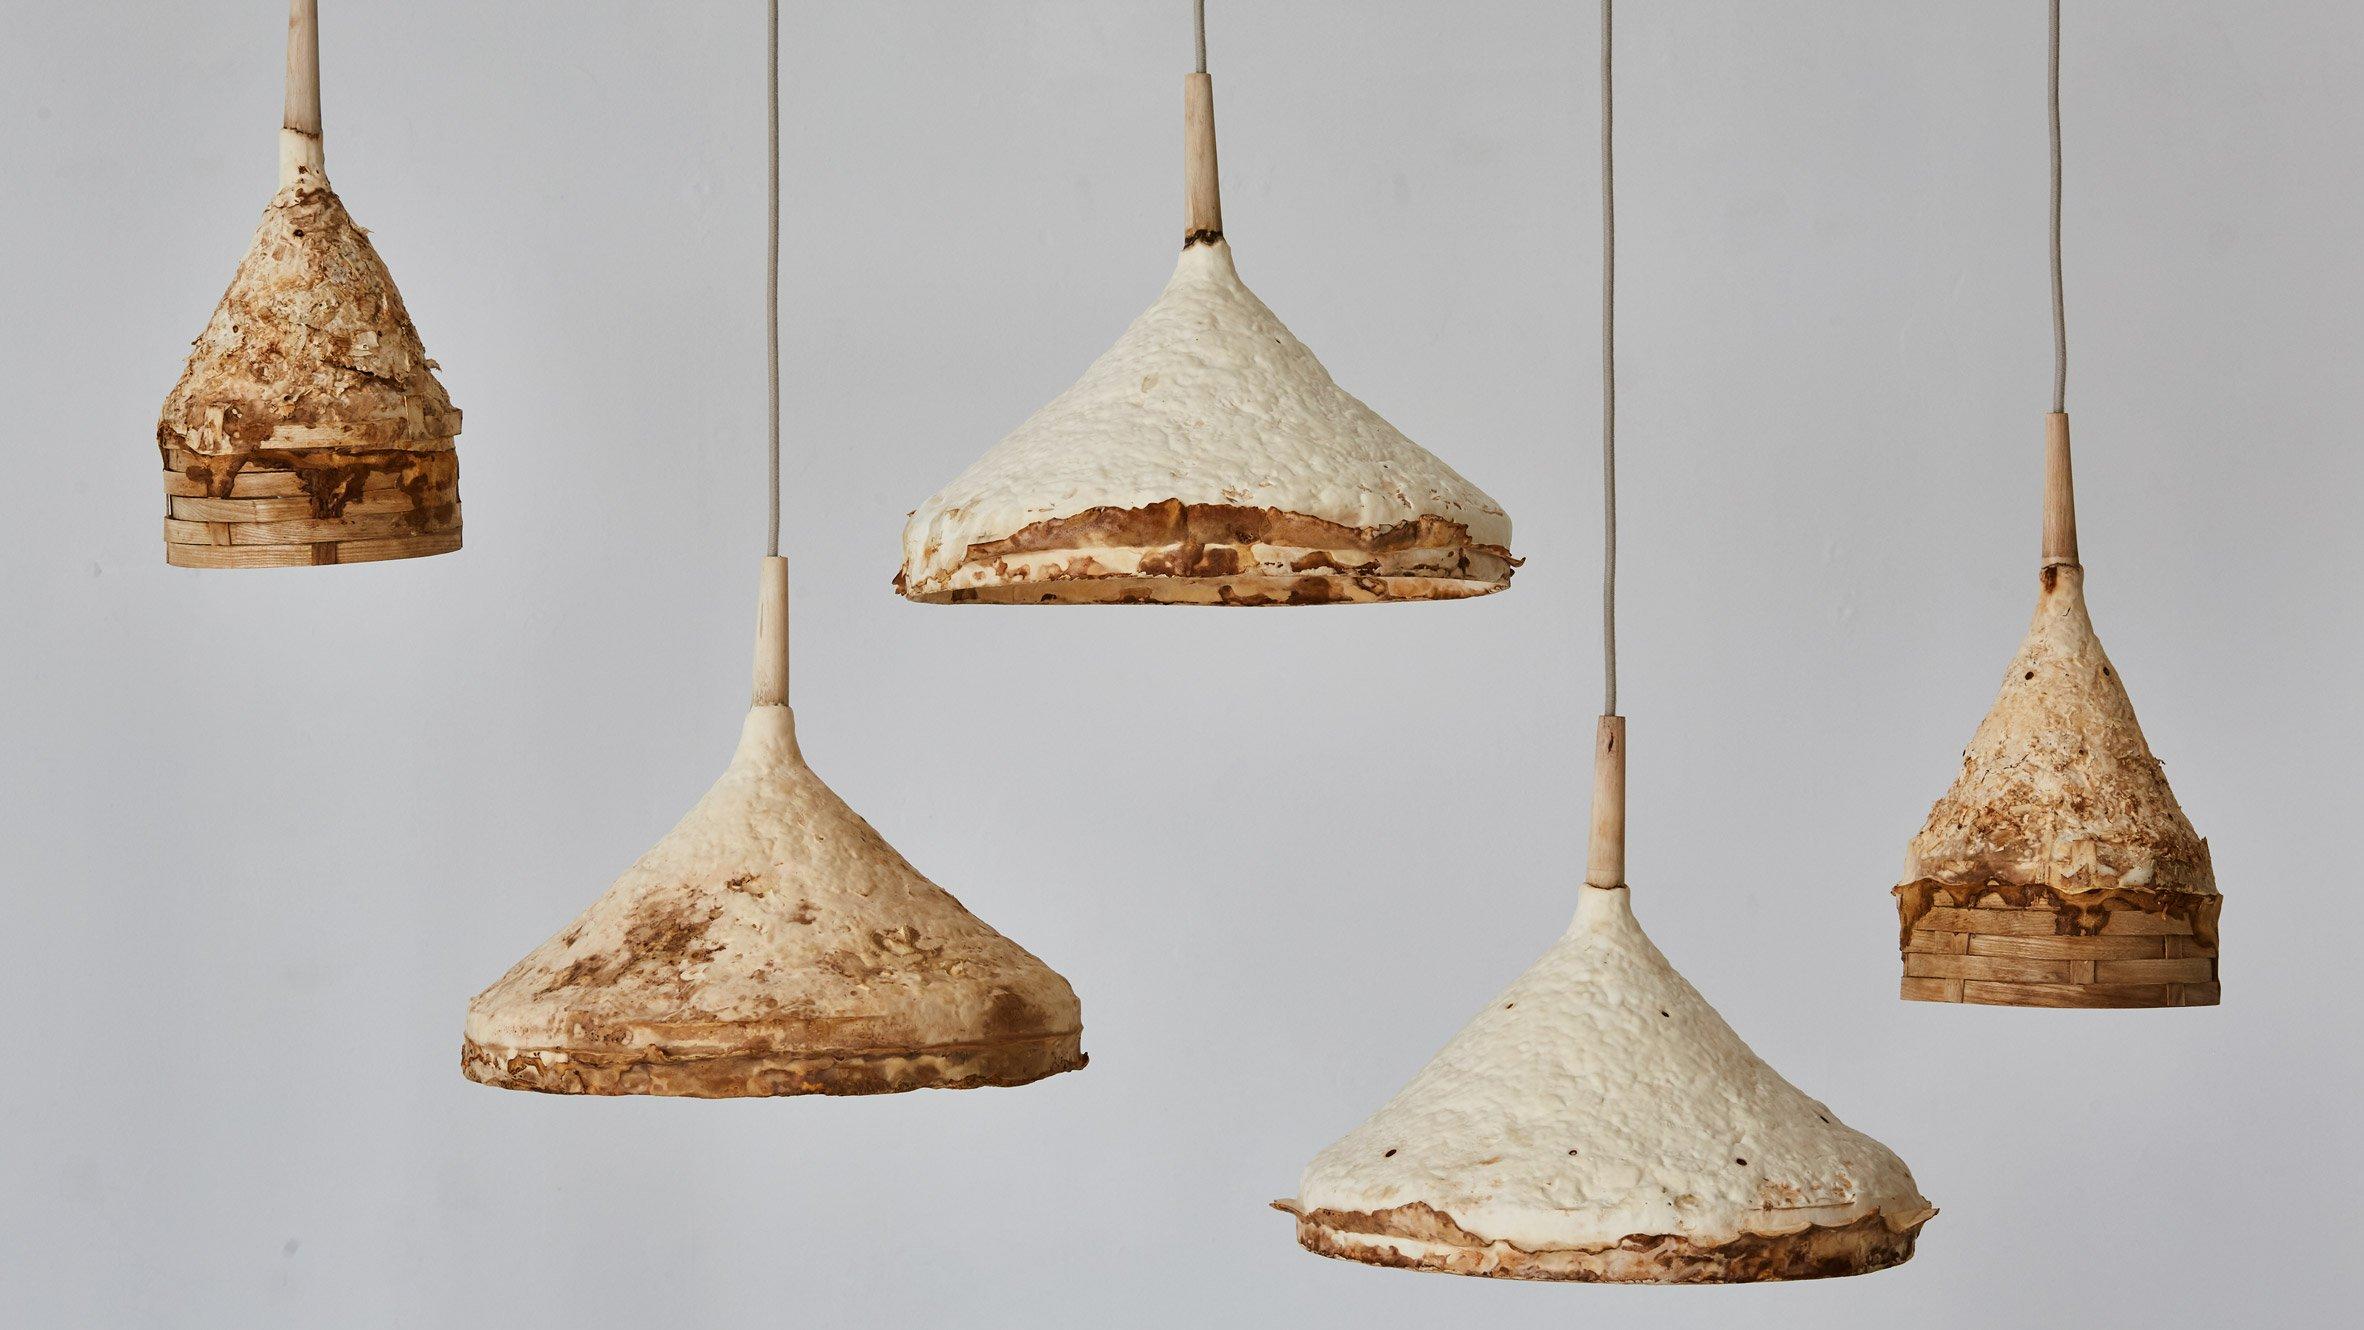 ... Mushroom mycelium used to create suede-like furniture by Sebastian Cox and Ninela Ivanova & Stool design and product news | Dezeen islam-shia.org